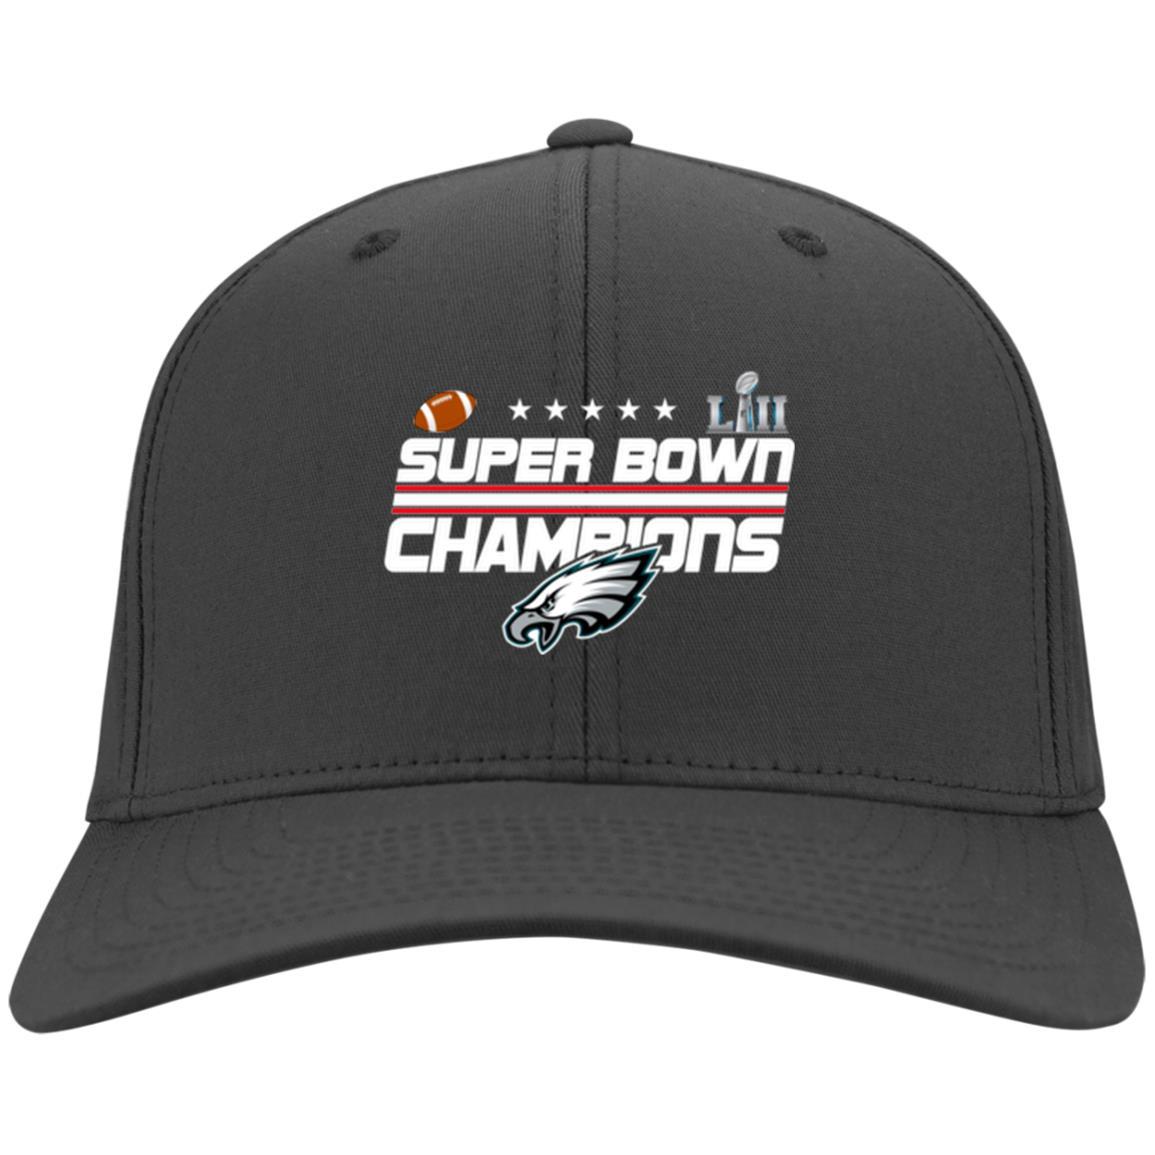 image 254 - Eagles Super Bowl Champions Hats